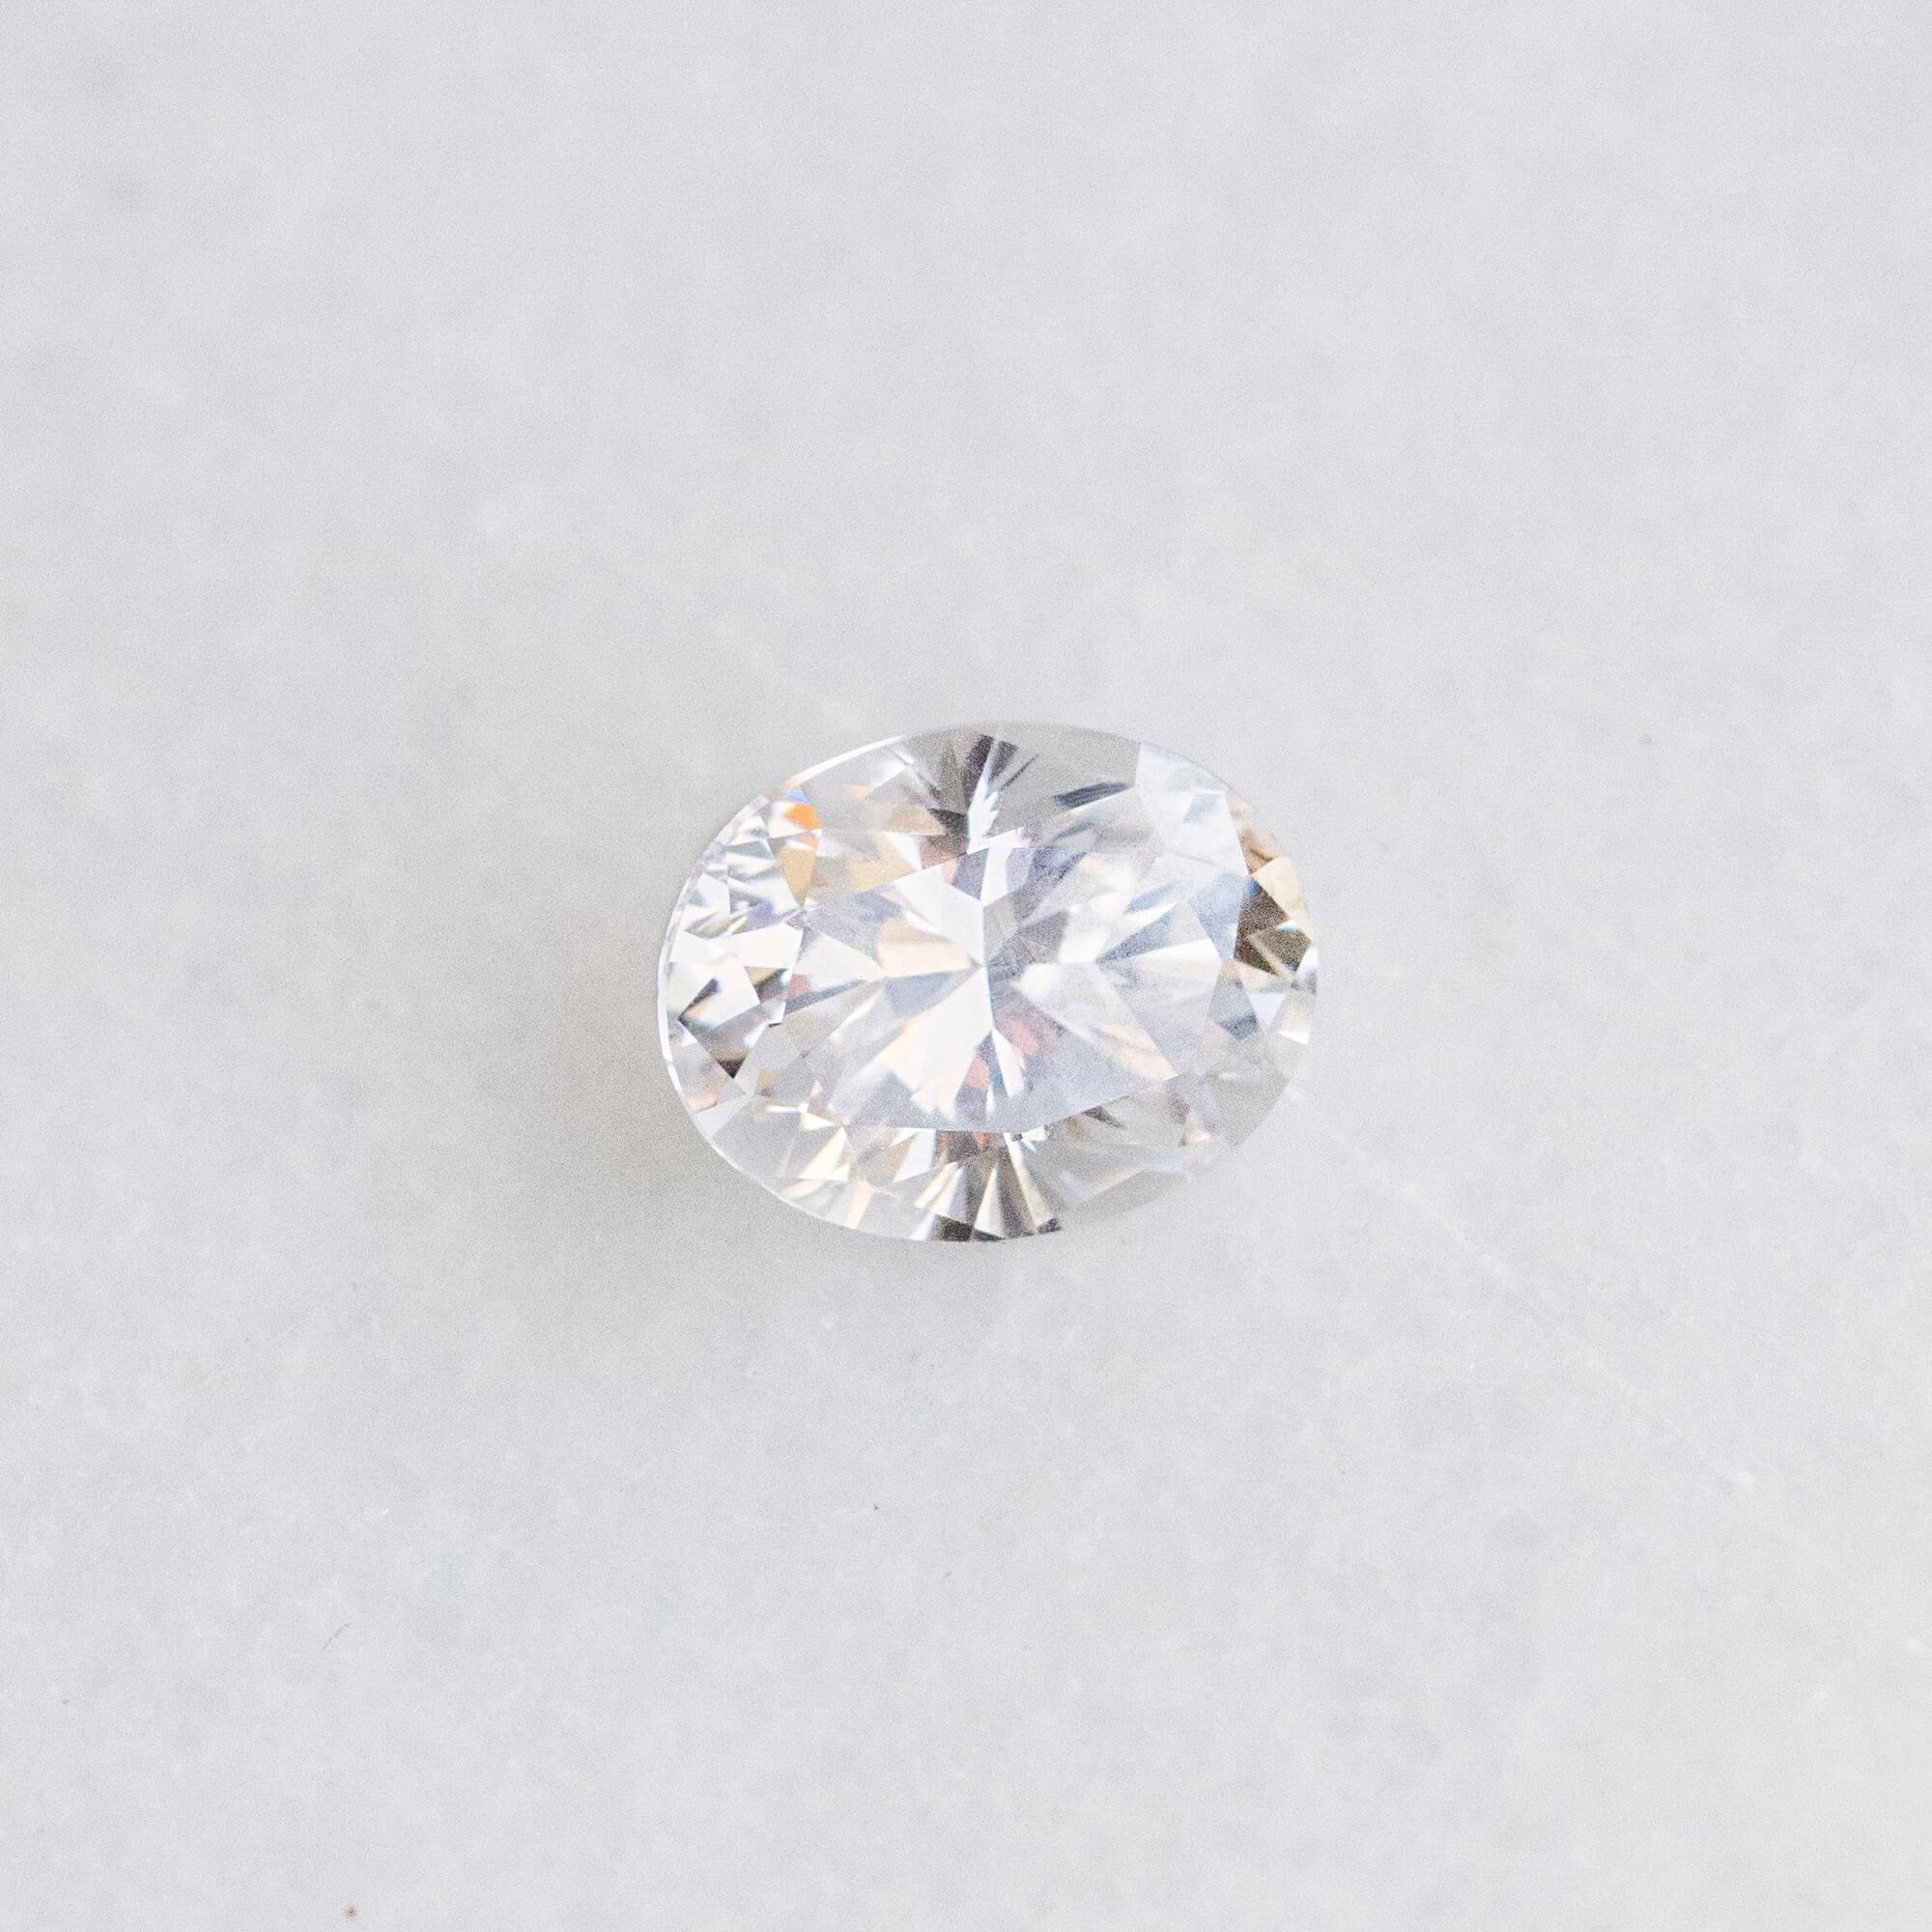 An Oval Nexus Diamond alternative.